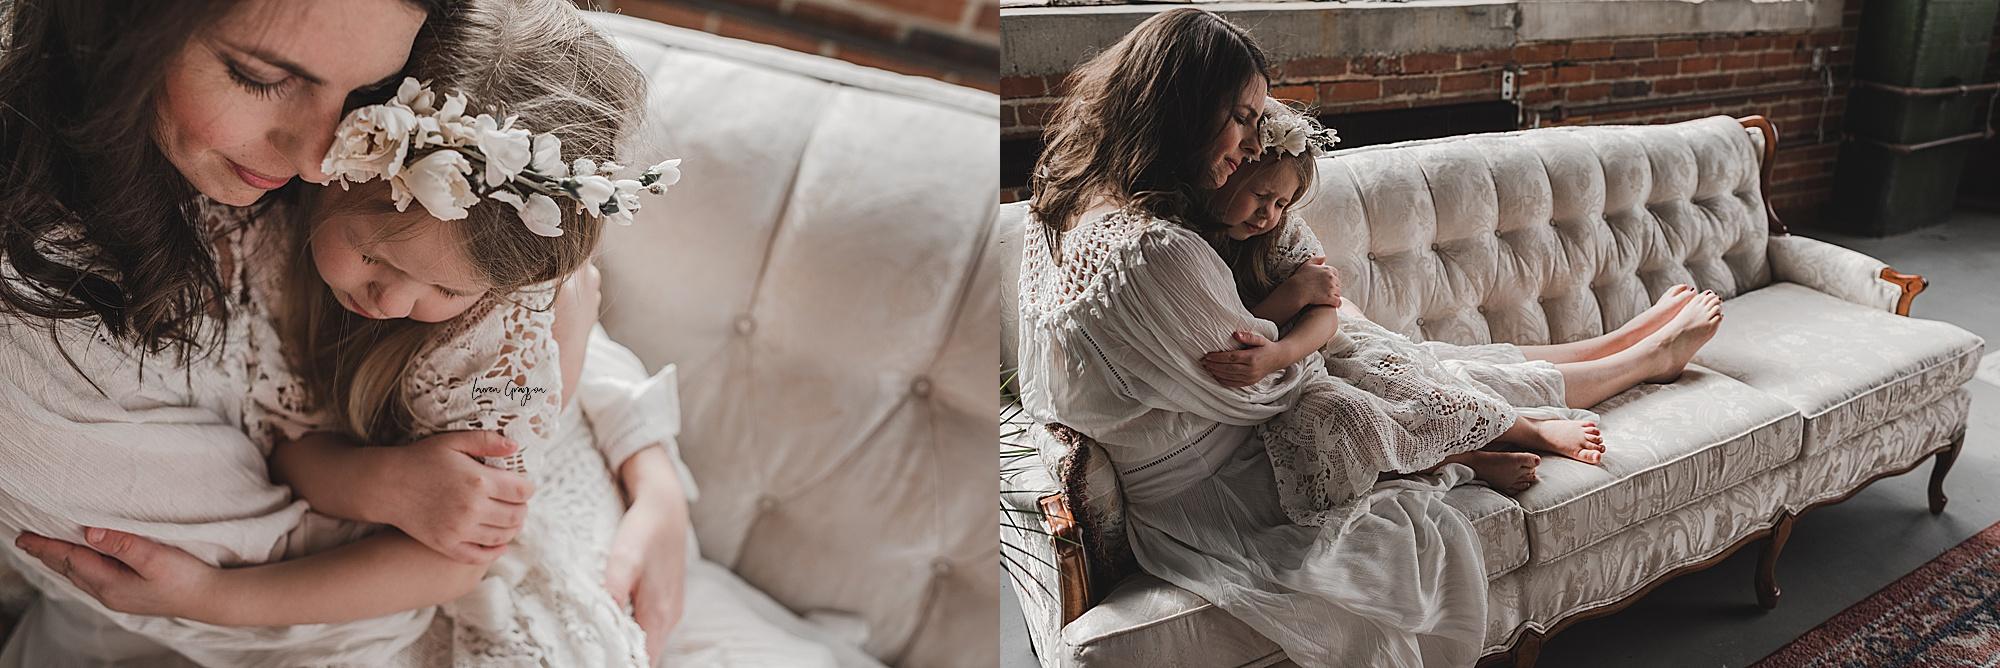 lauren-grayson-photography-canton-ohio-newborn-family-photographer-woods-lacey_0055.jpg